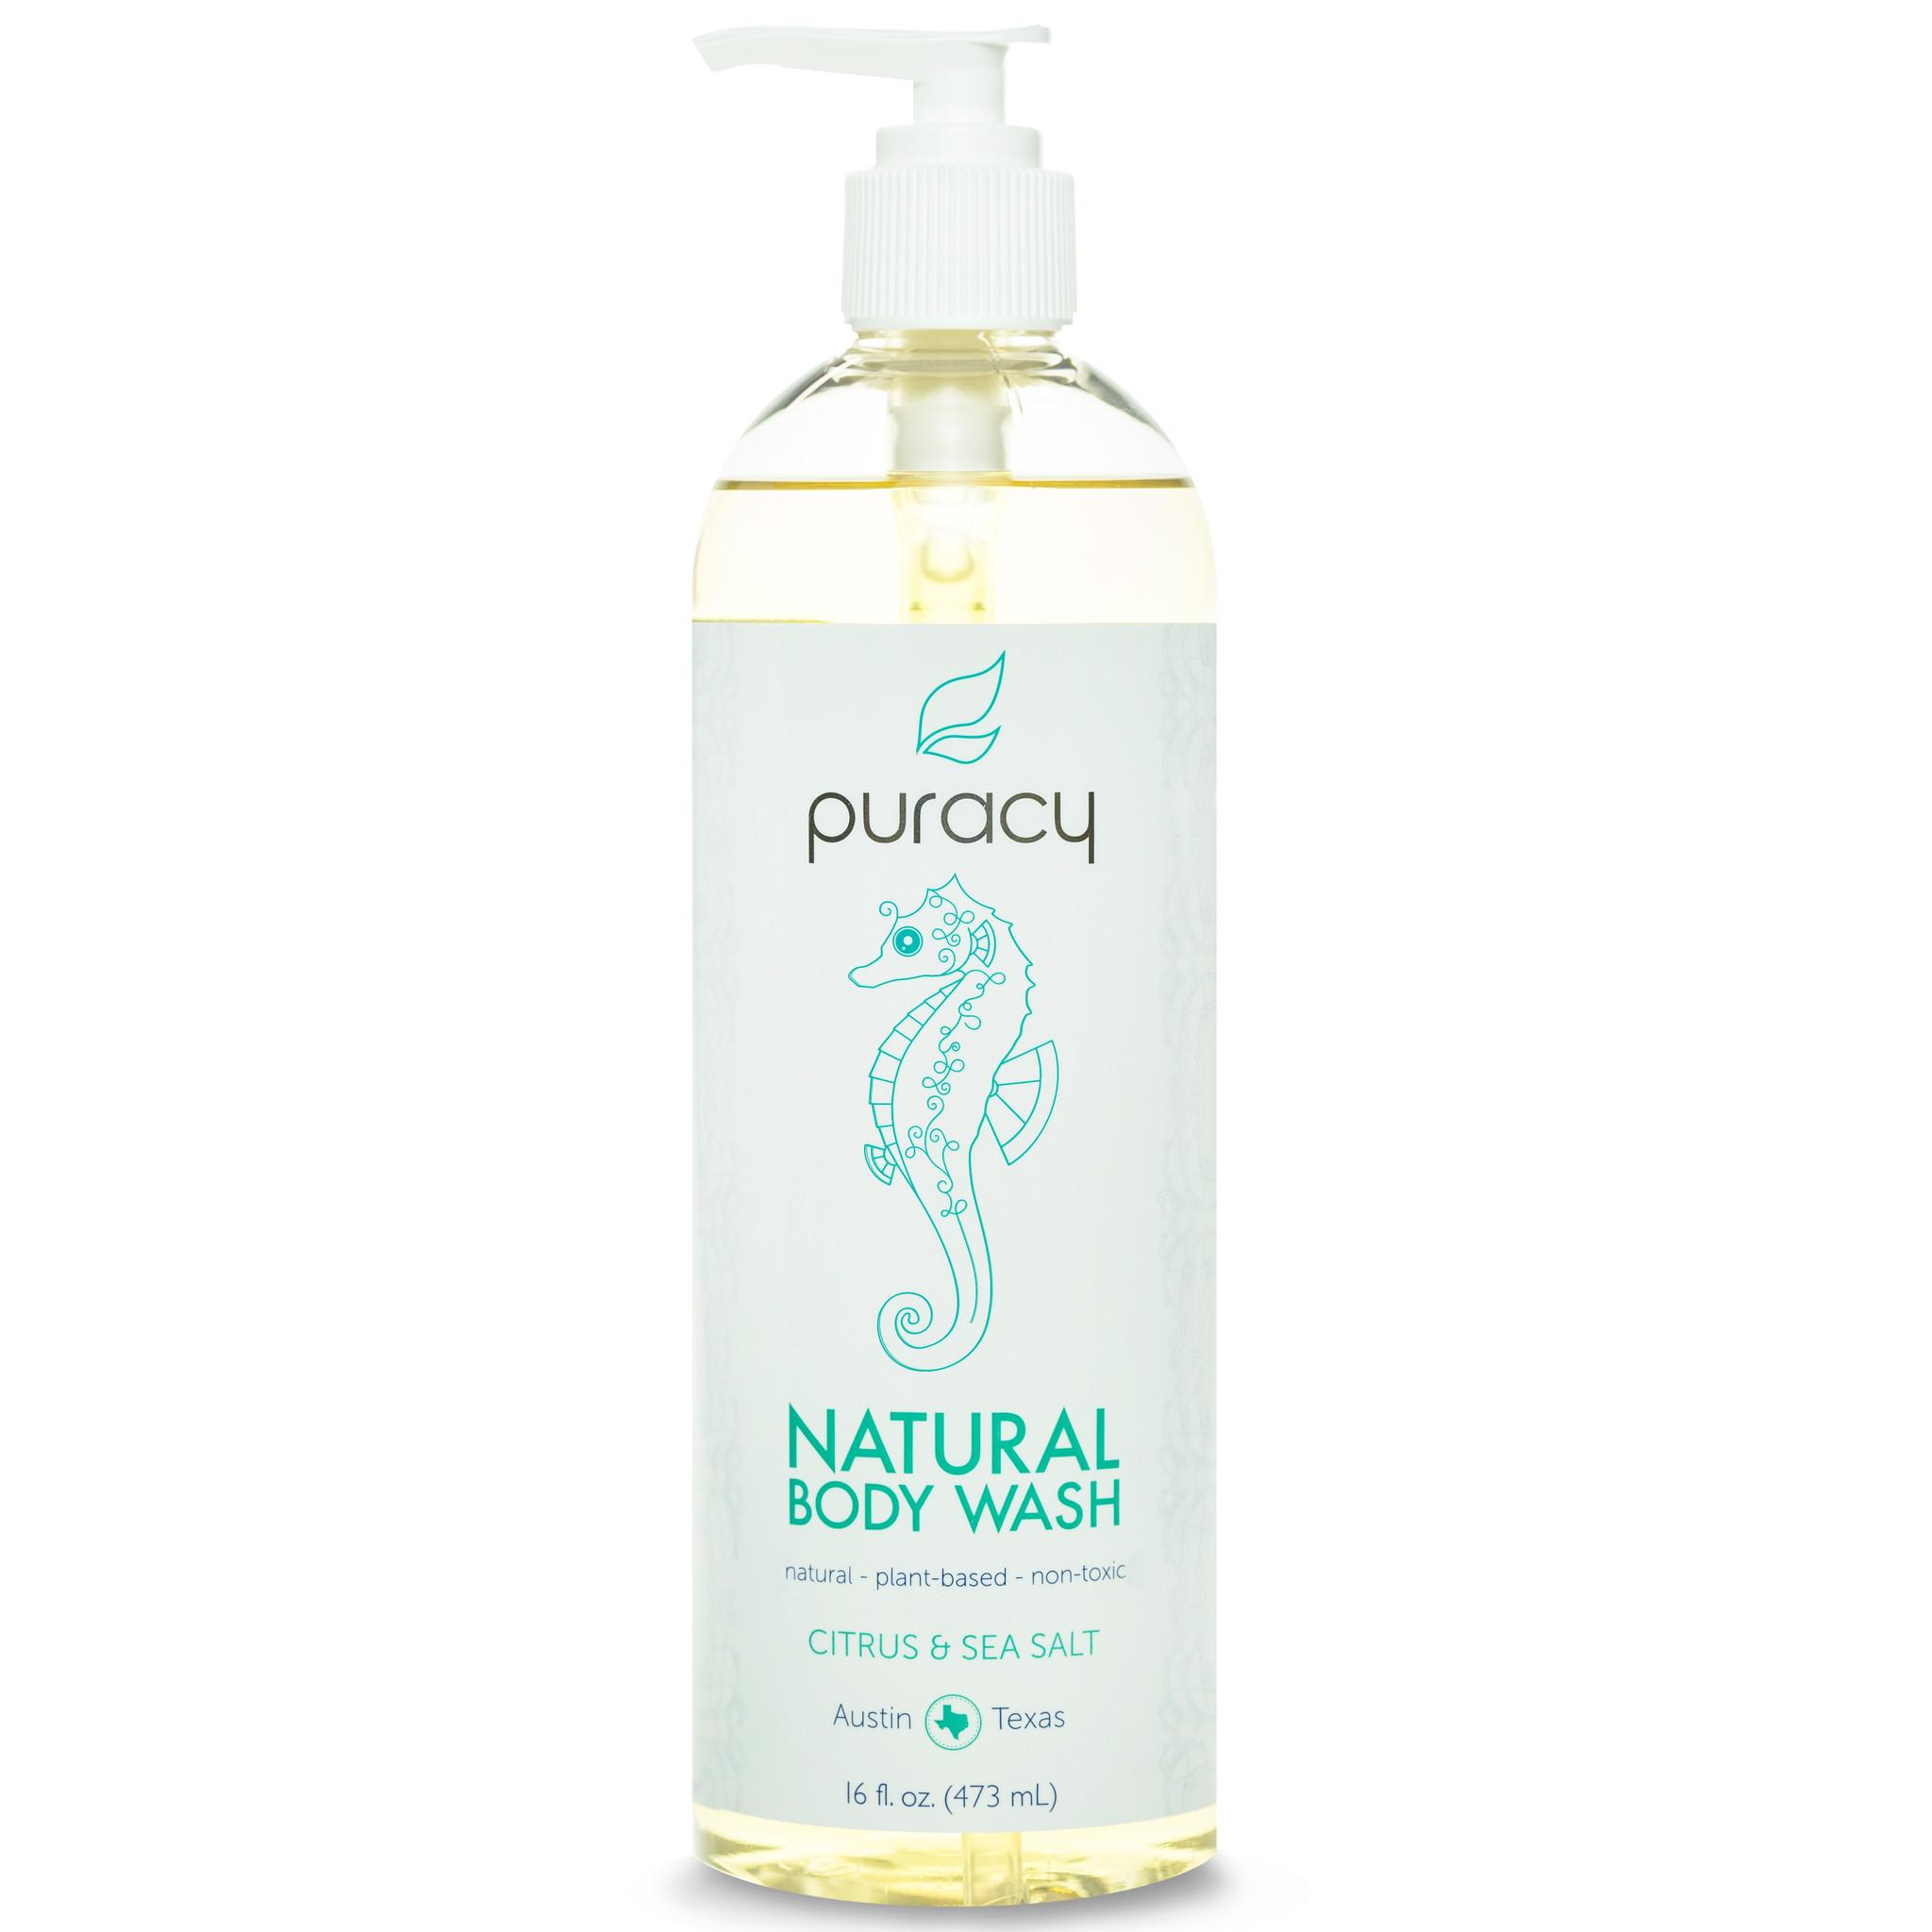 Puracy 100% Sulfate-Free Natural Body Wash